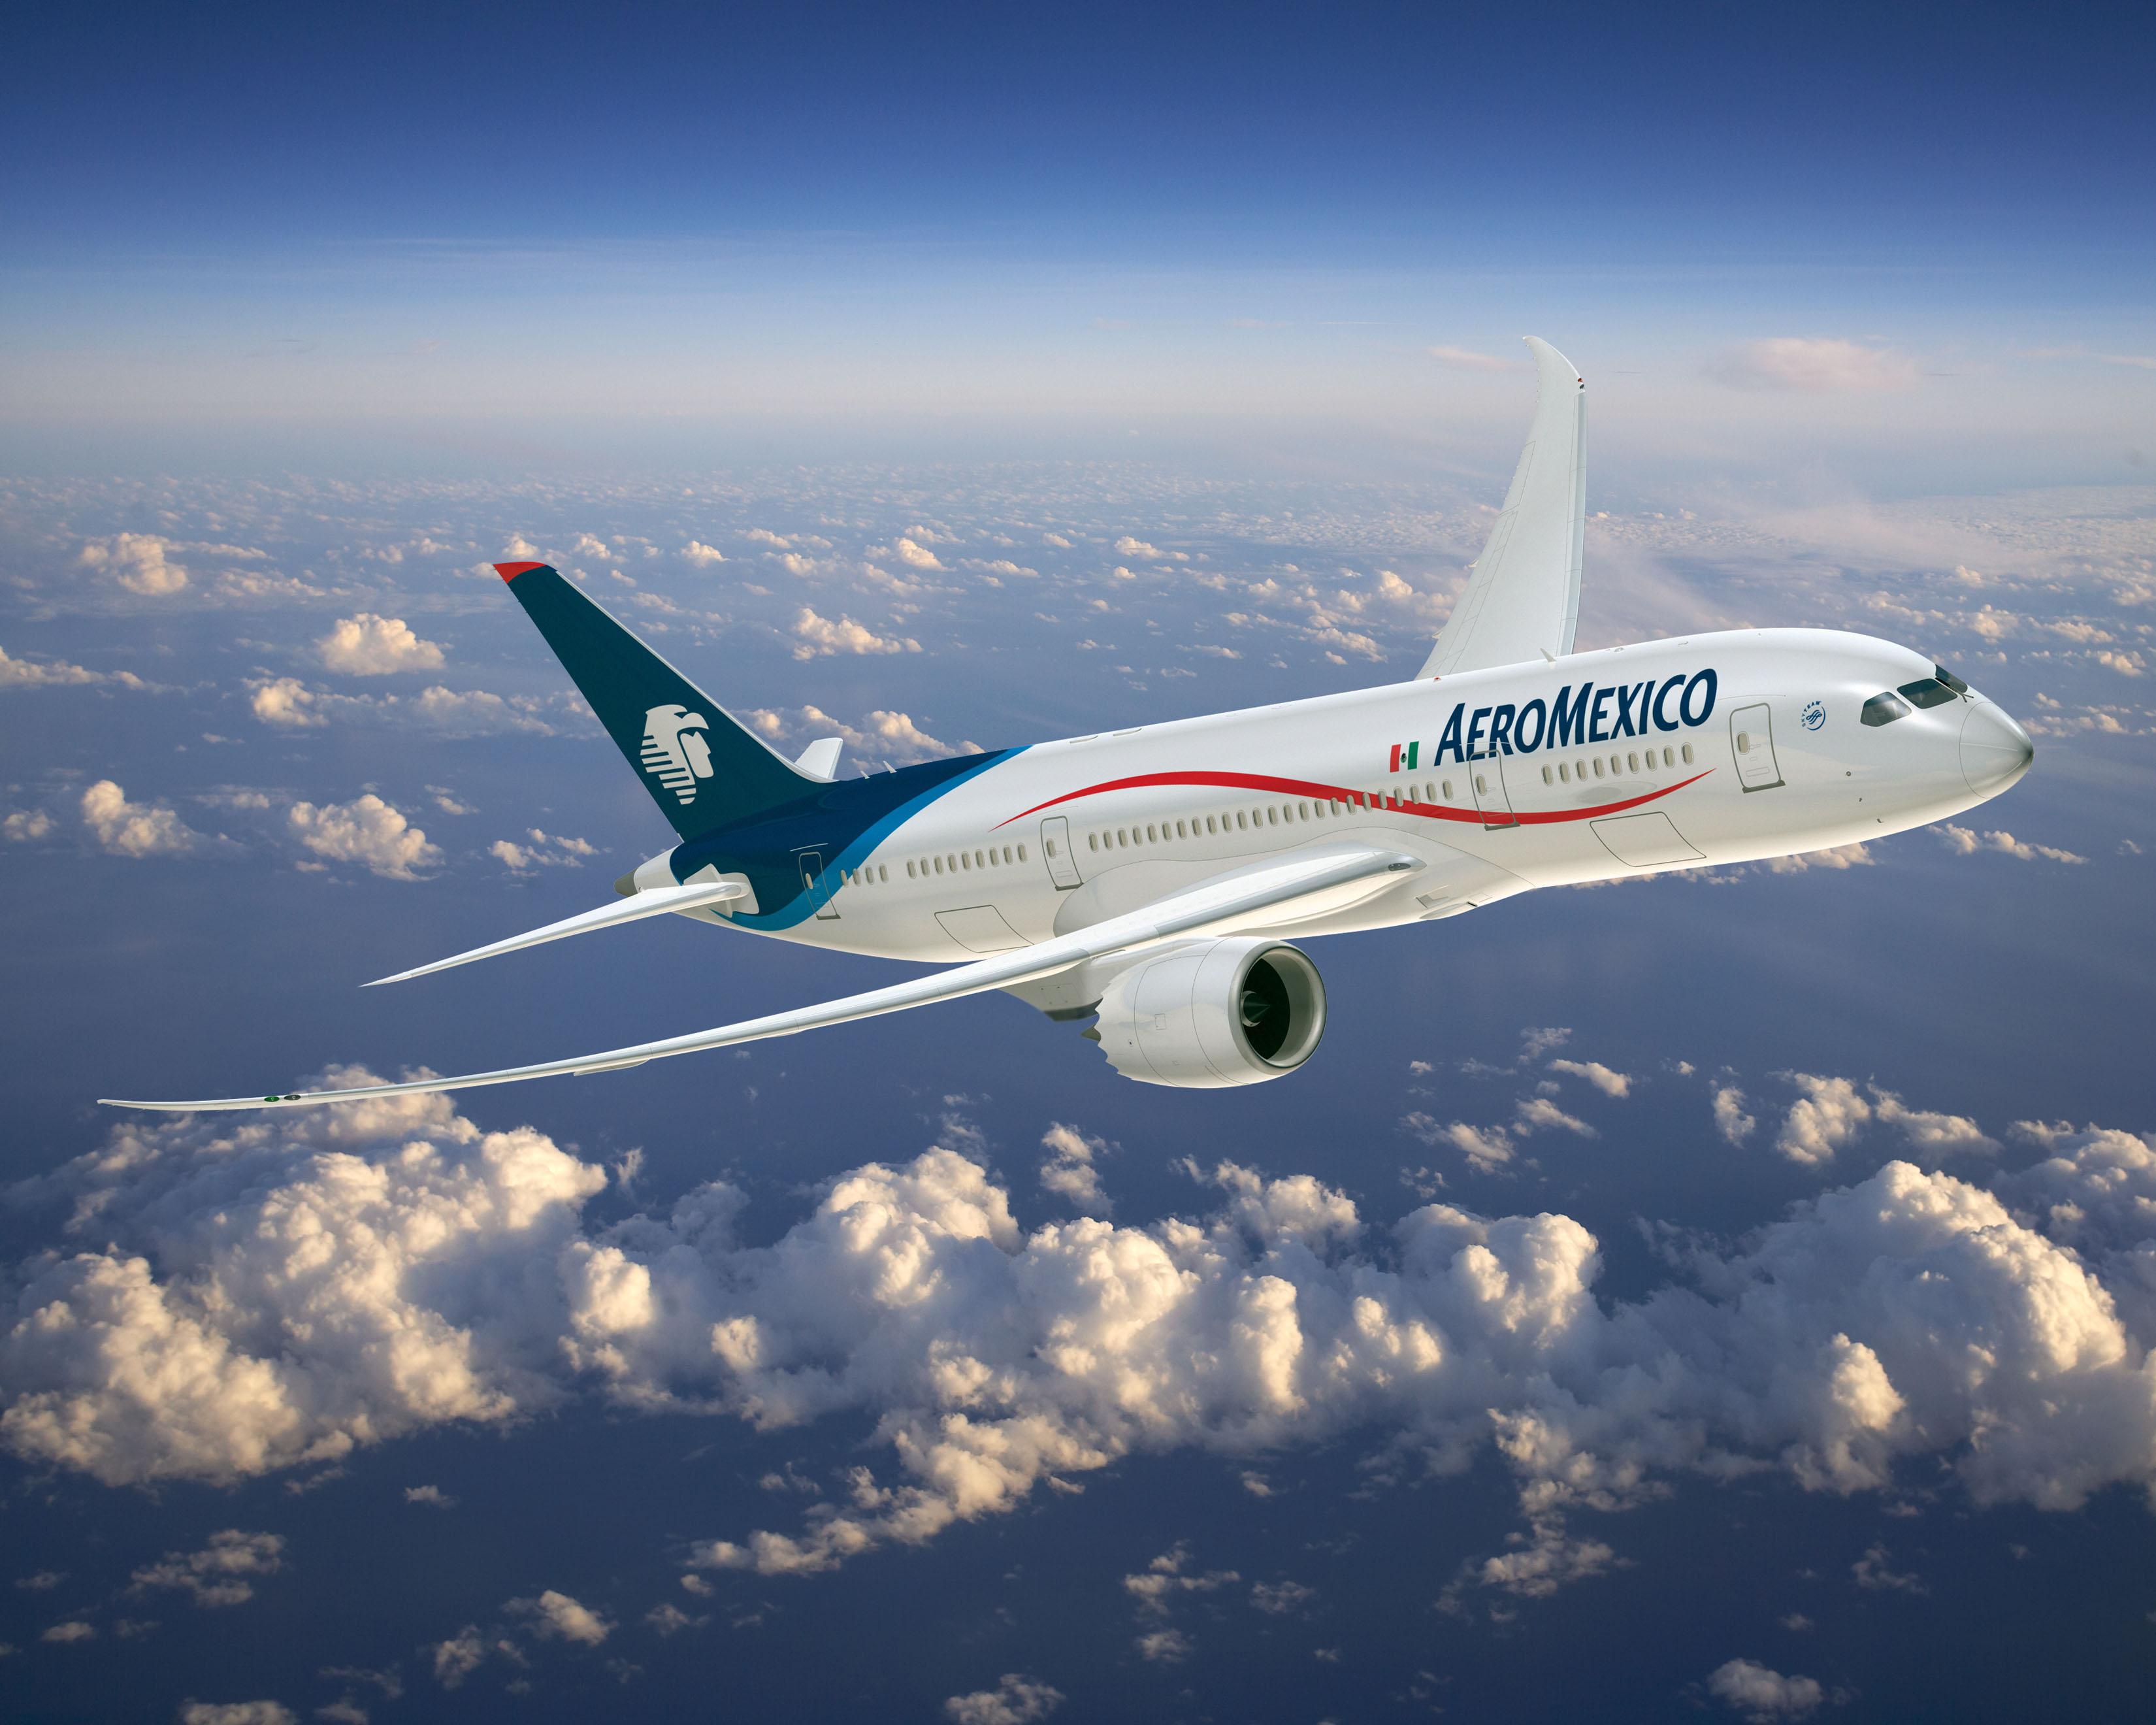 Traduction transport aérien Aeromexico